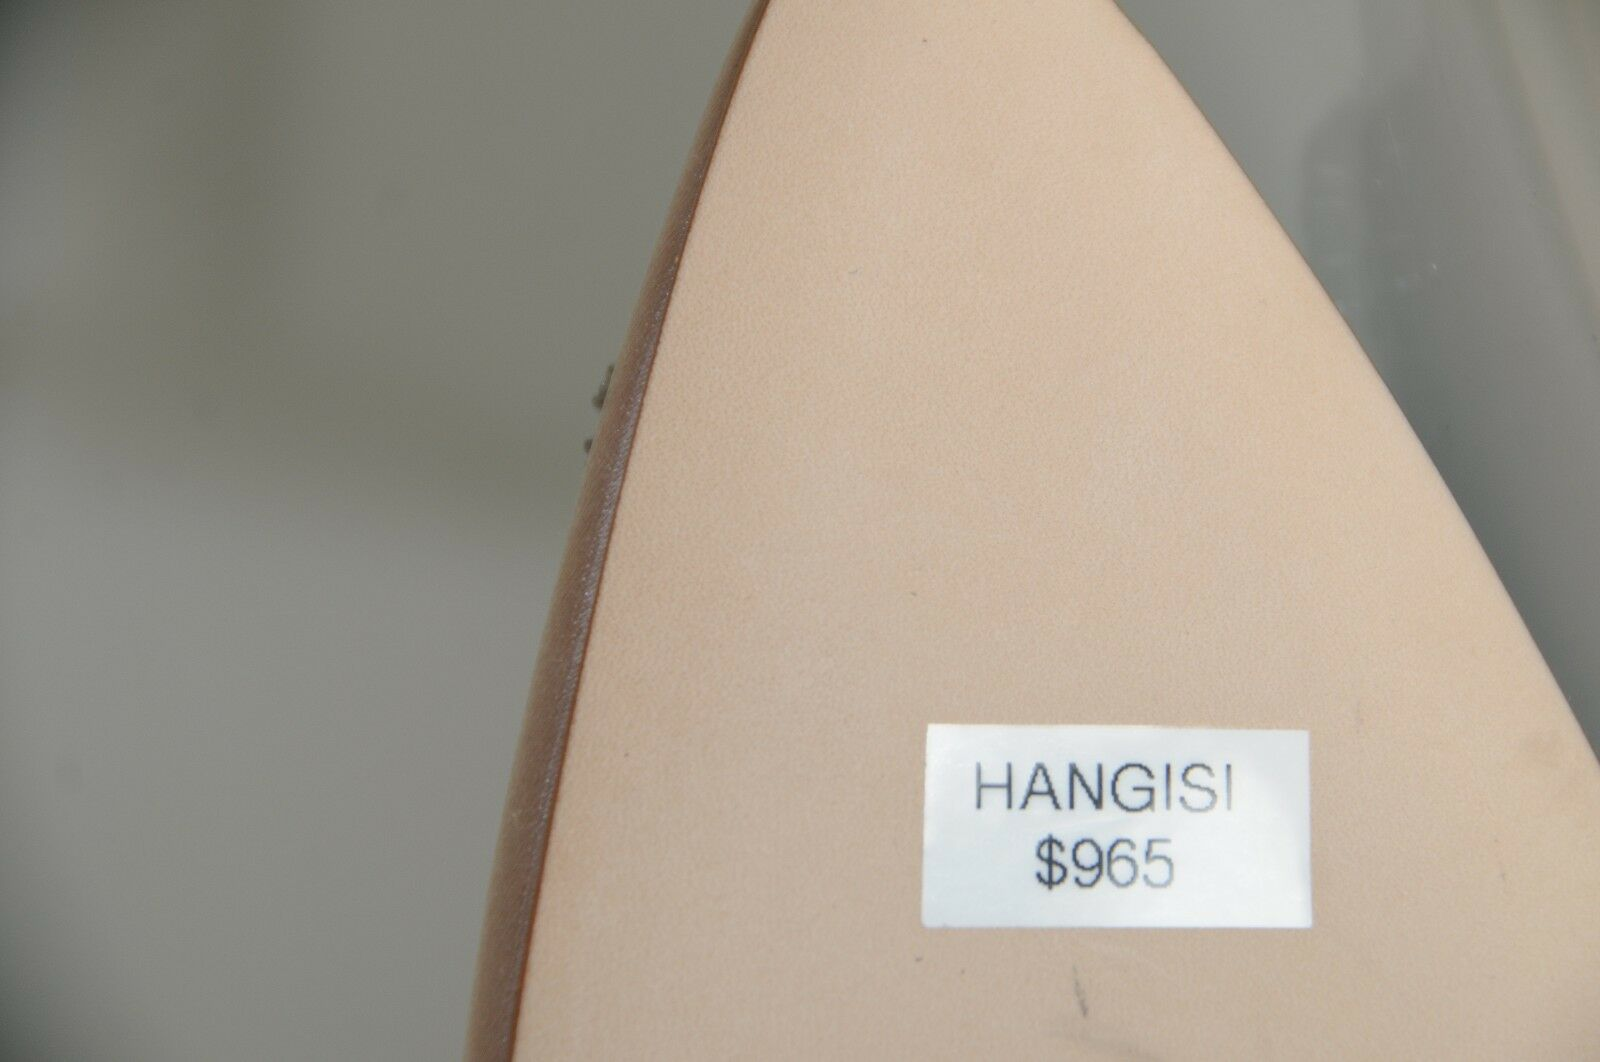 Nude 965 NEW MANOLO BLAHNIK HANGISI Nude  Flesh Satin JEWELED Pumps schuhe 41 41.5 b79ba3